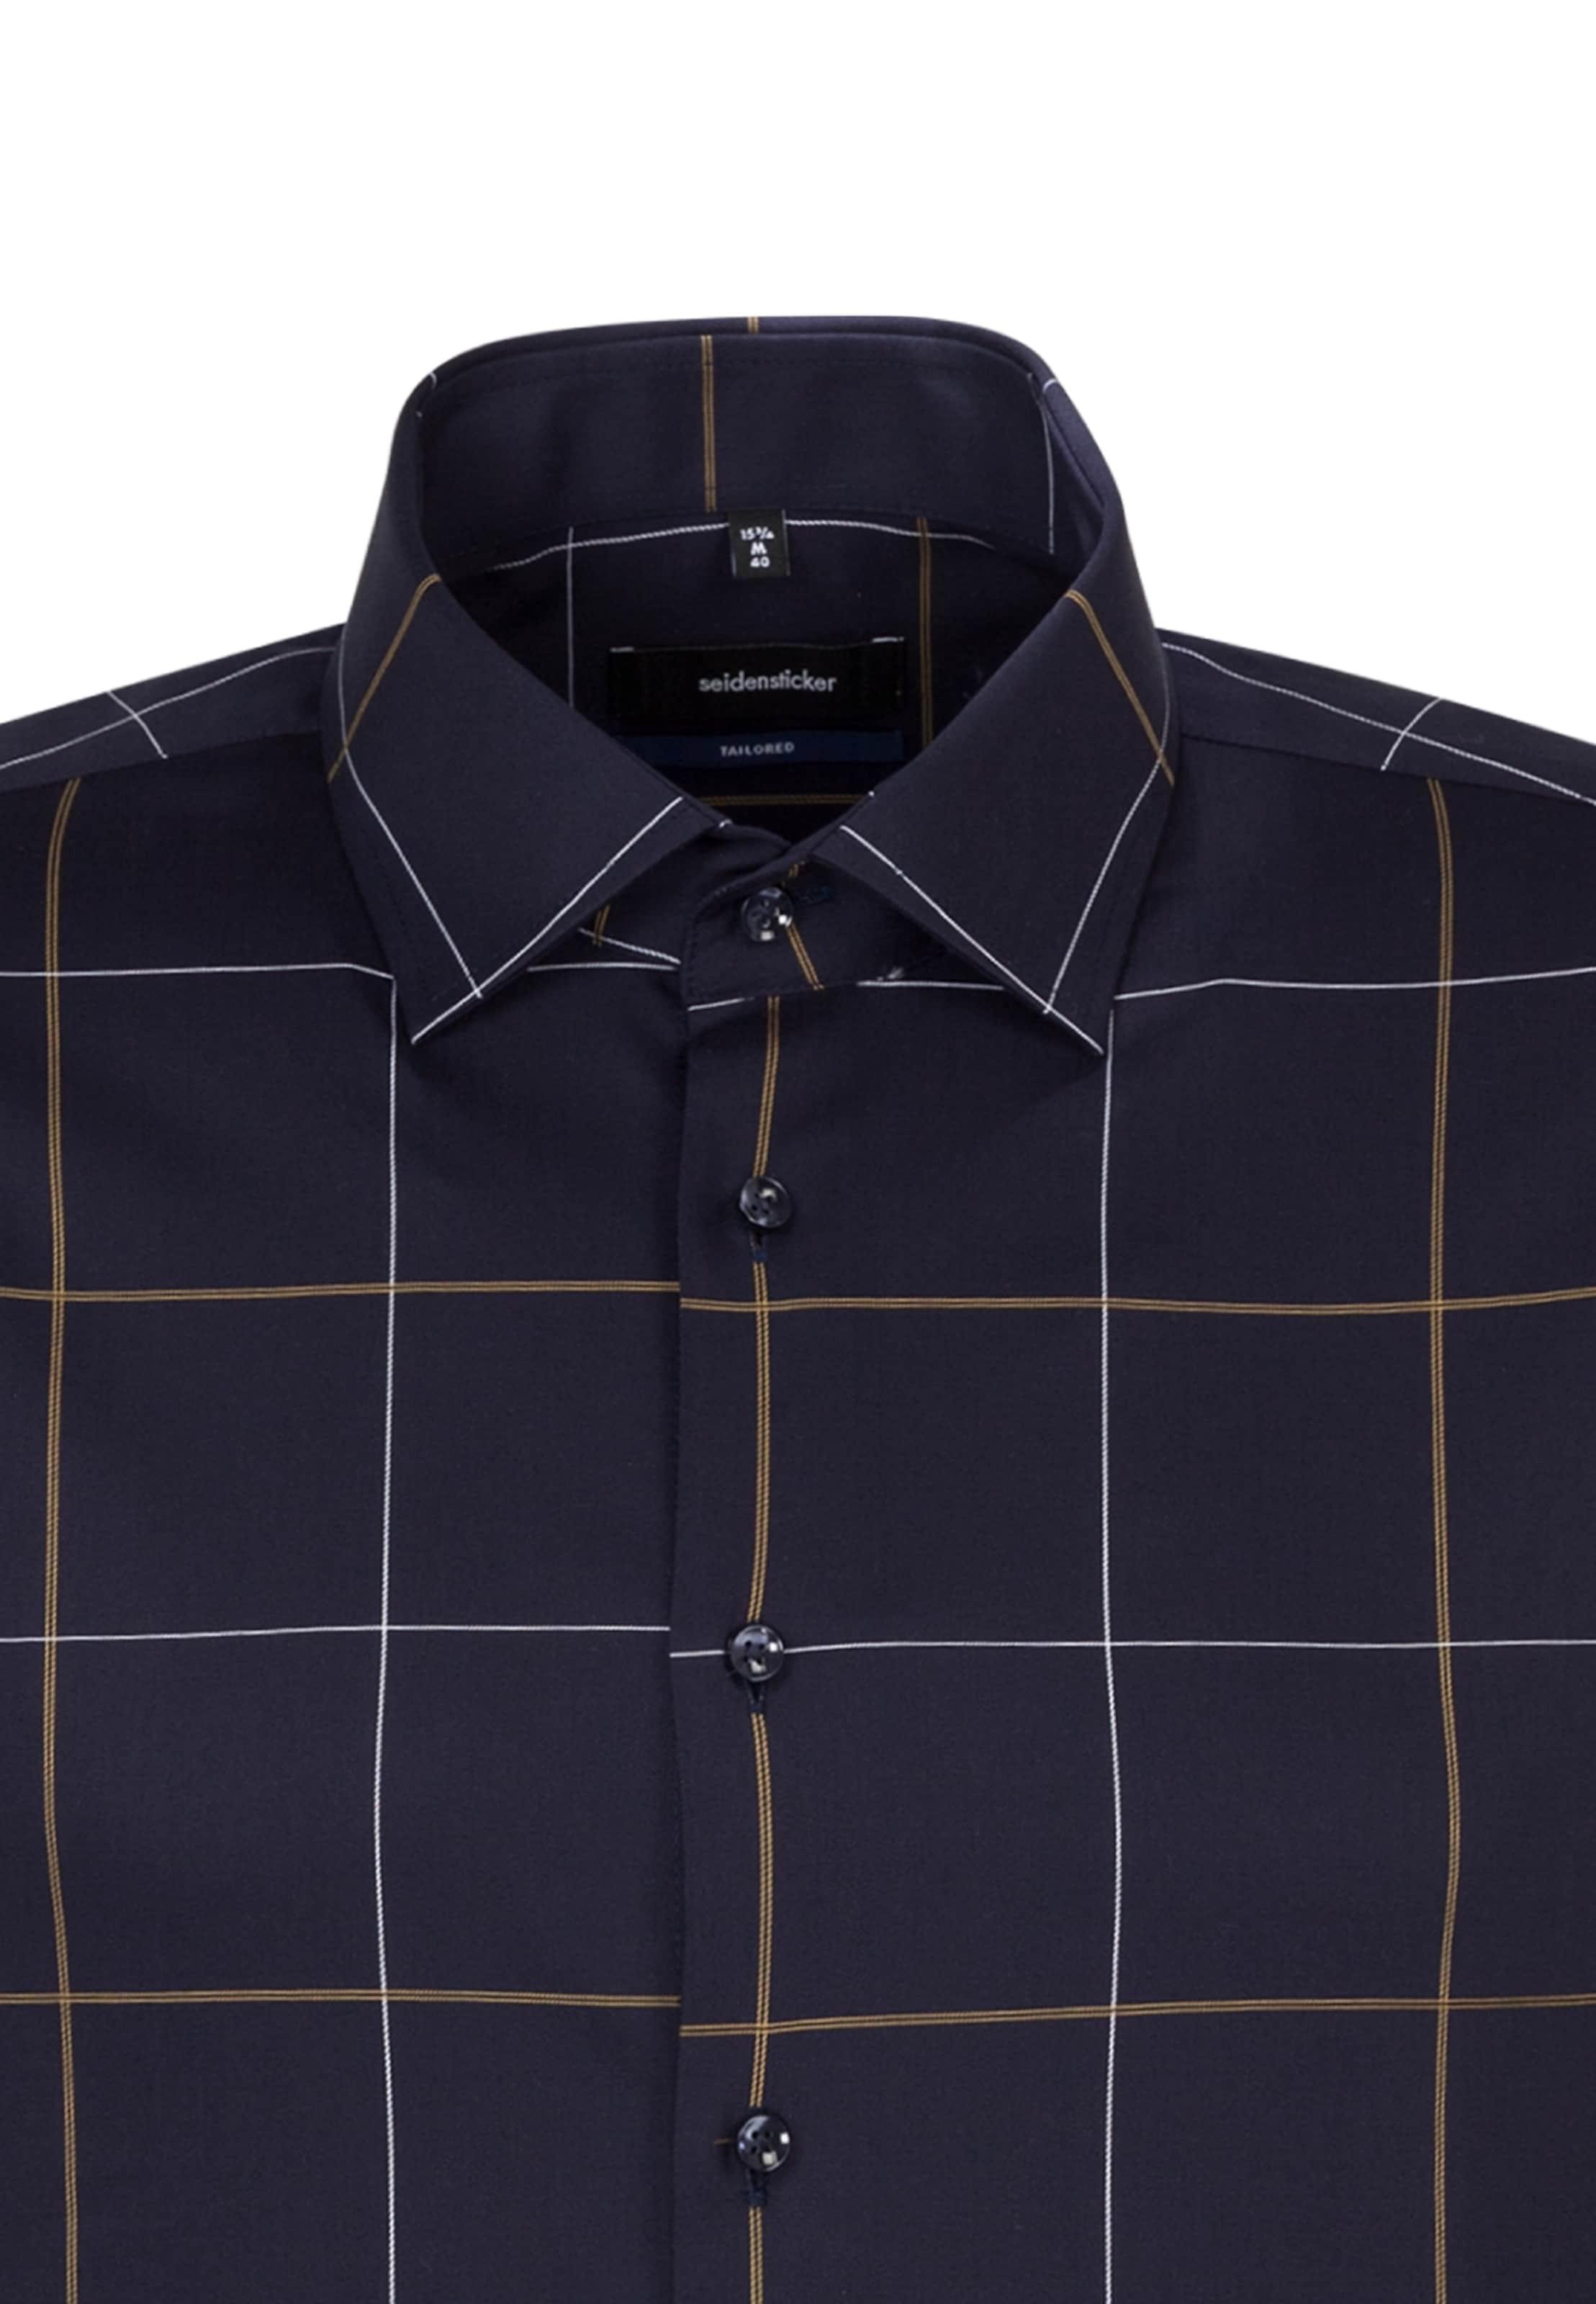 Dunkelblau Hemd 'tailored' 'tailored' In Hemd In Seidensticker Seidensticker e2IWDYE9H